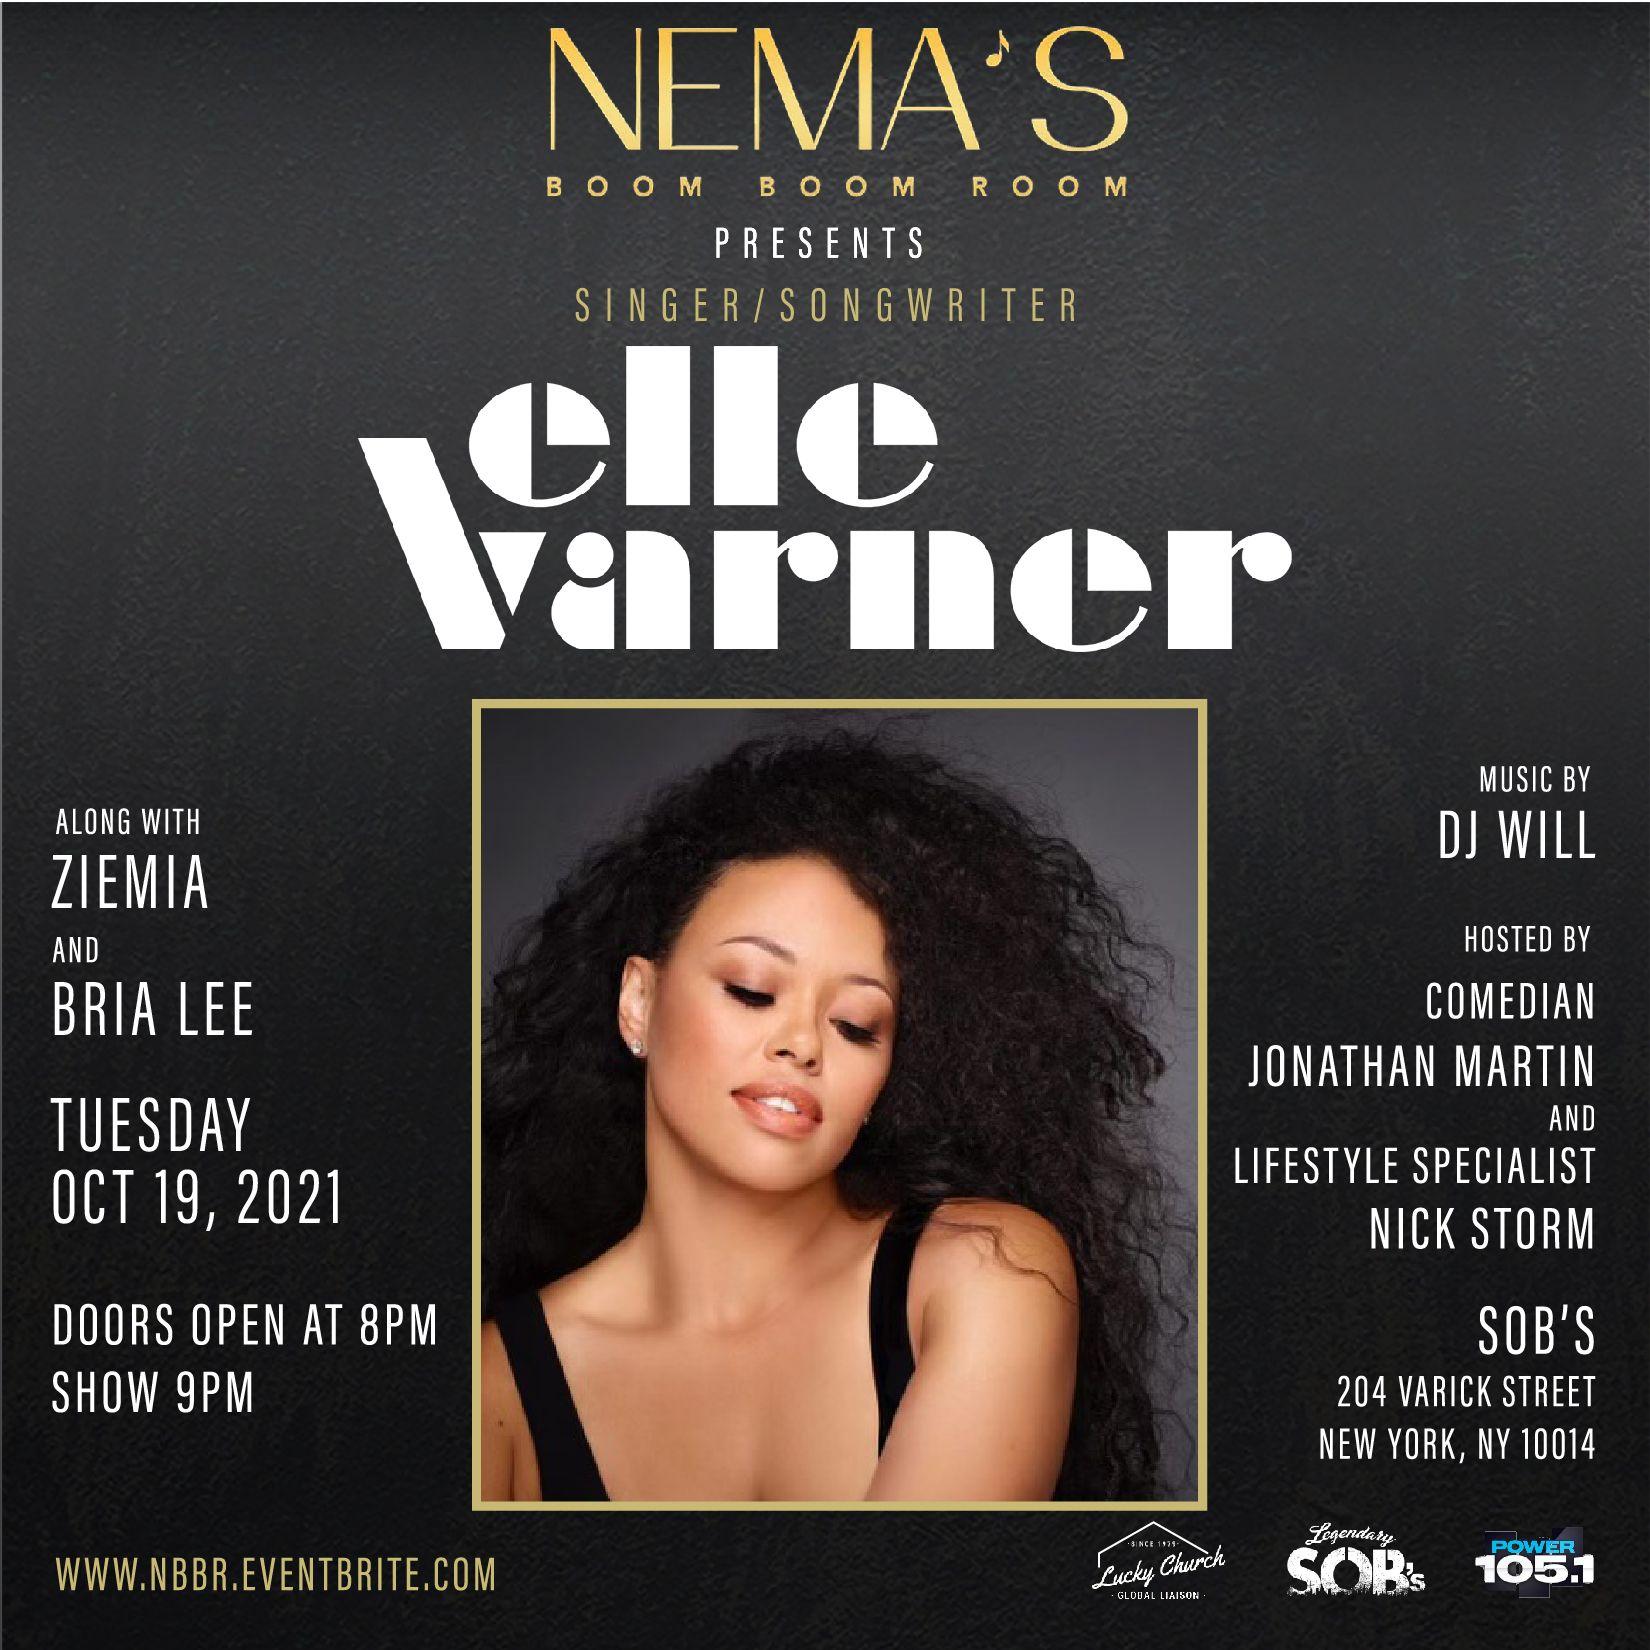 Nema's Boom Boom Room Presents Elle Varner: